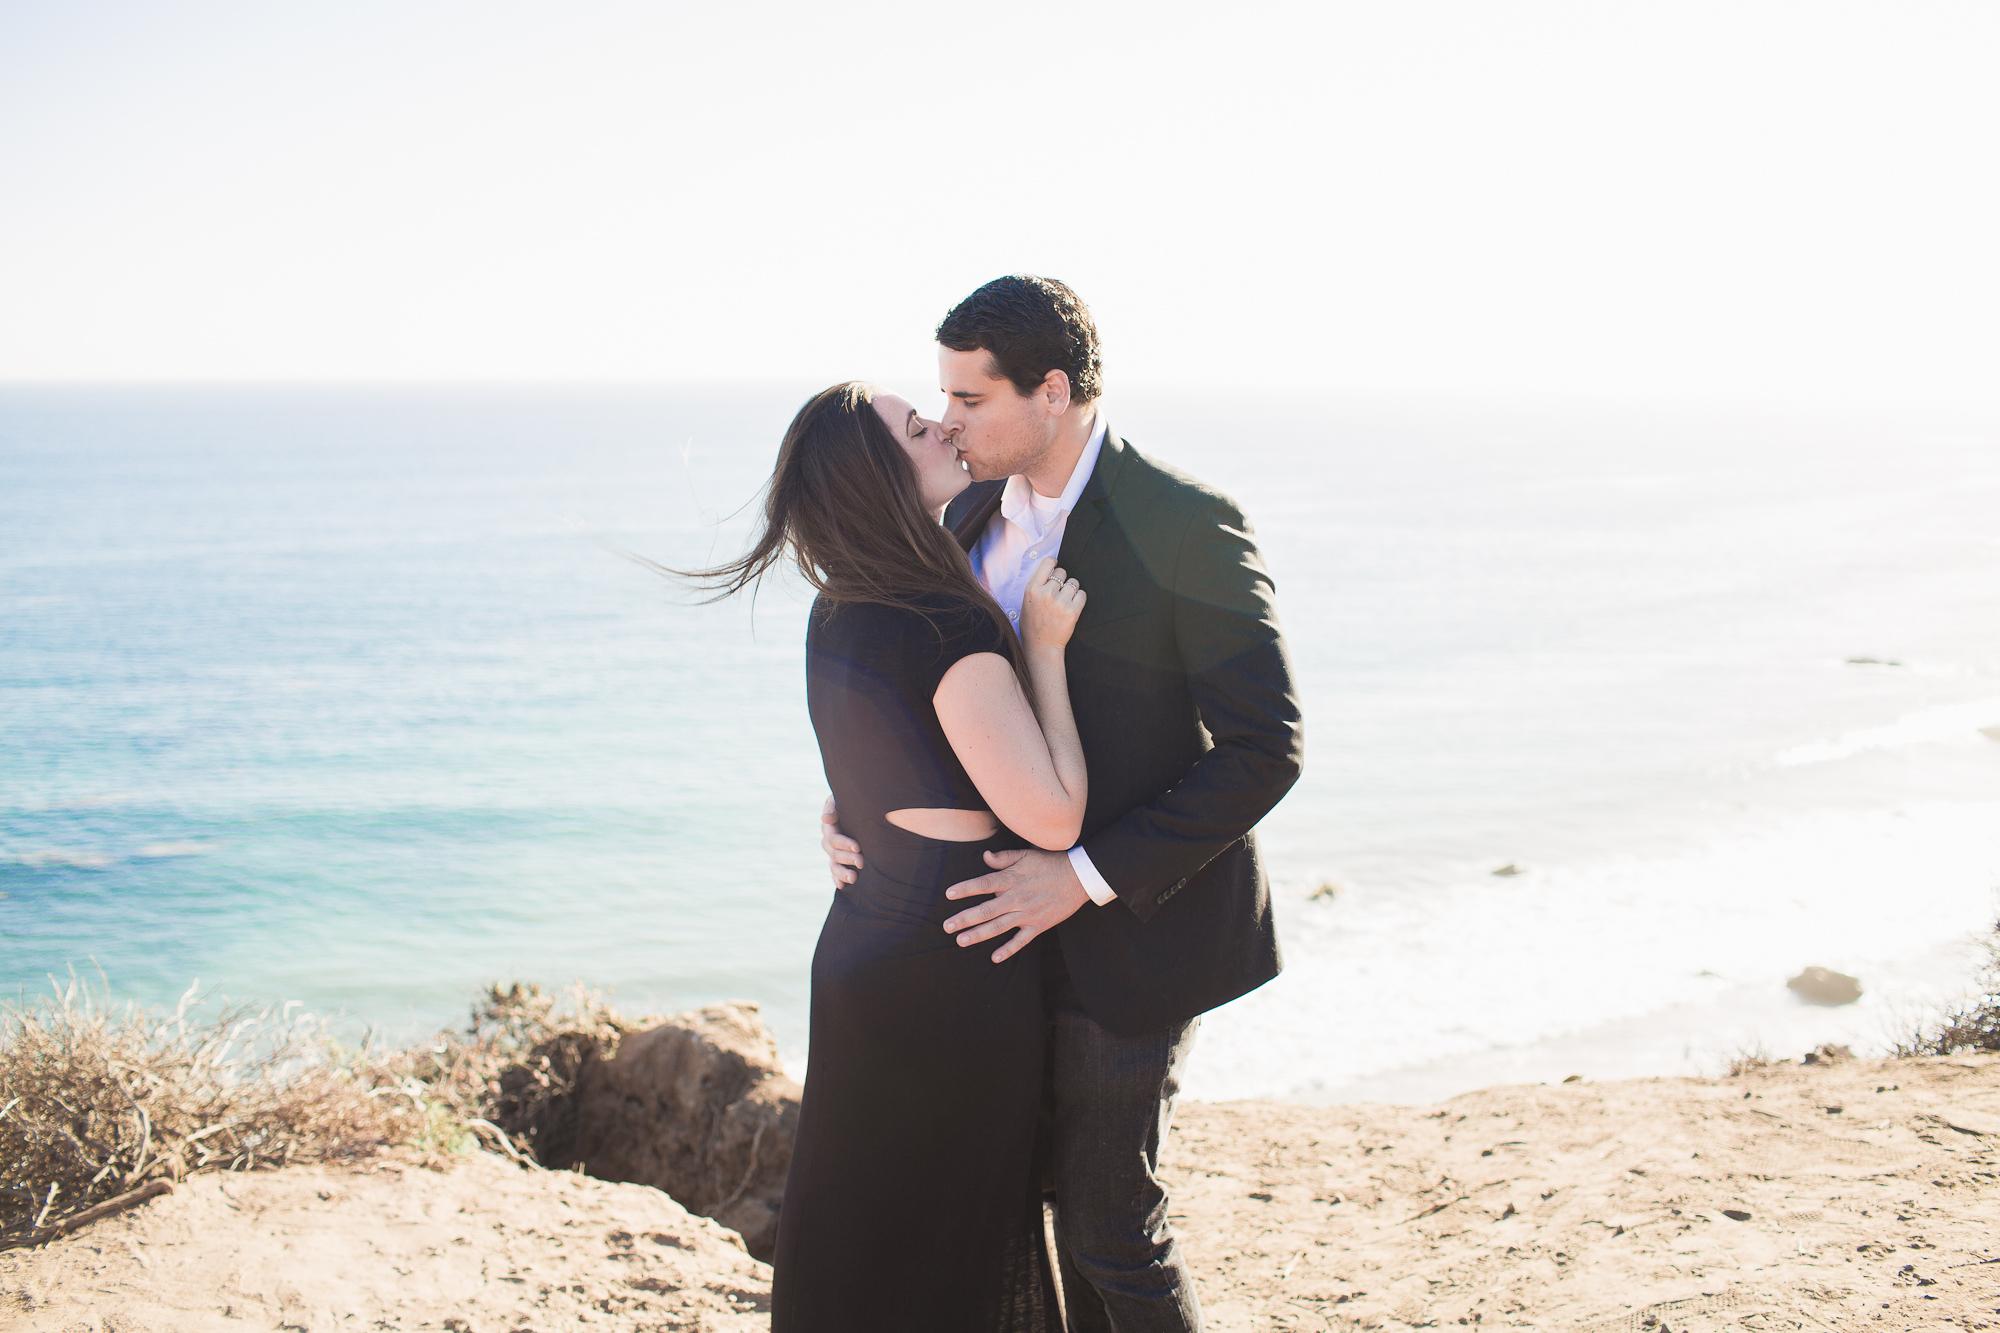 Rosi + Daniel's engagement shoot at El Matador. You can never go wrong at this spot!